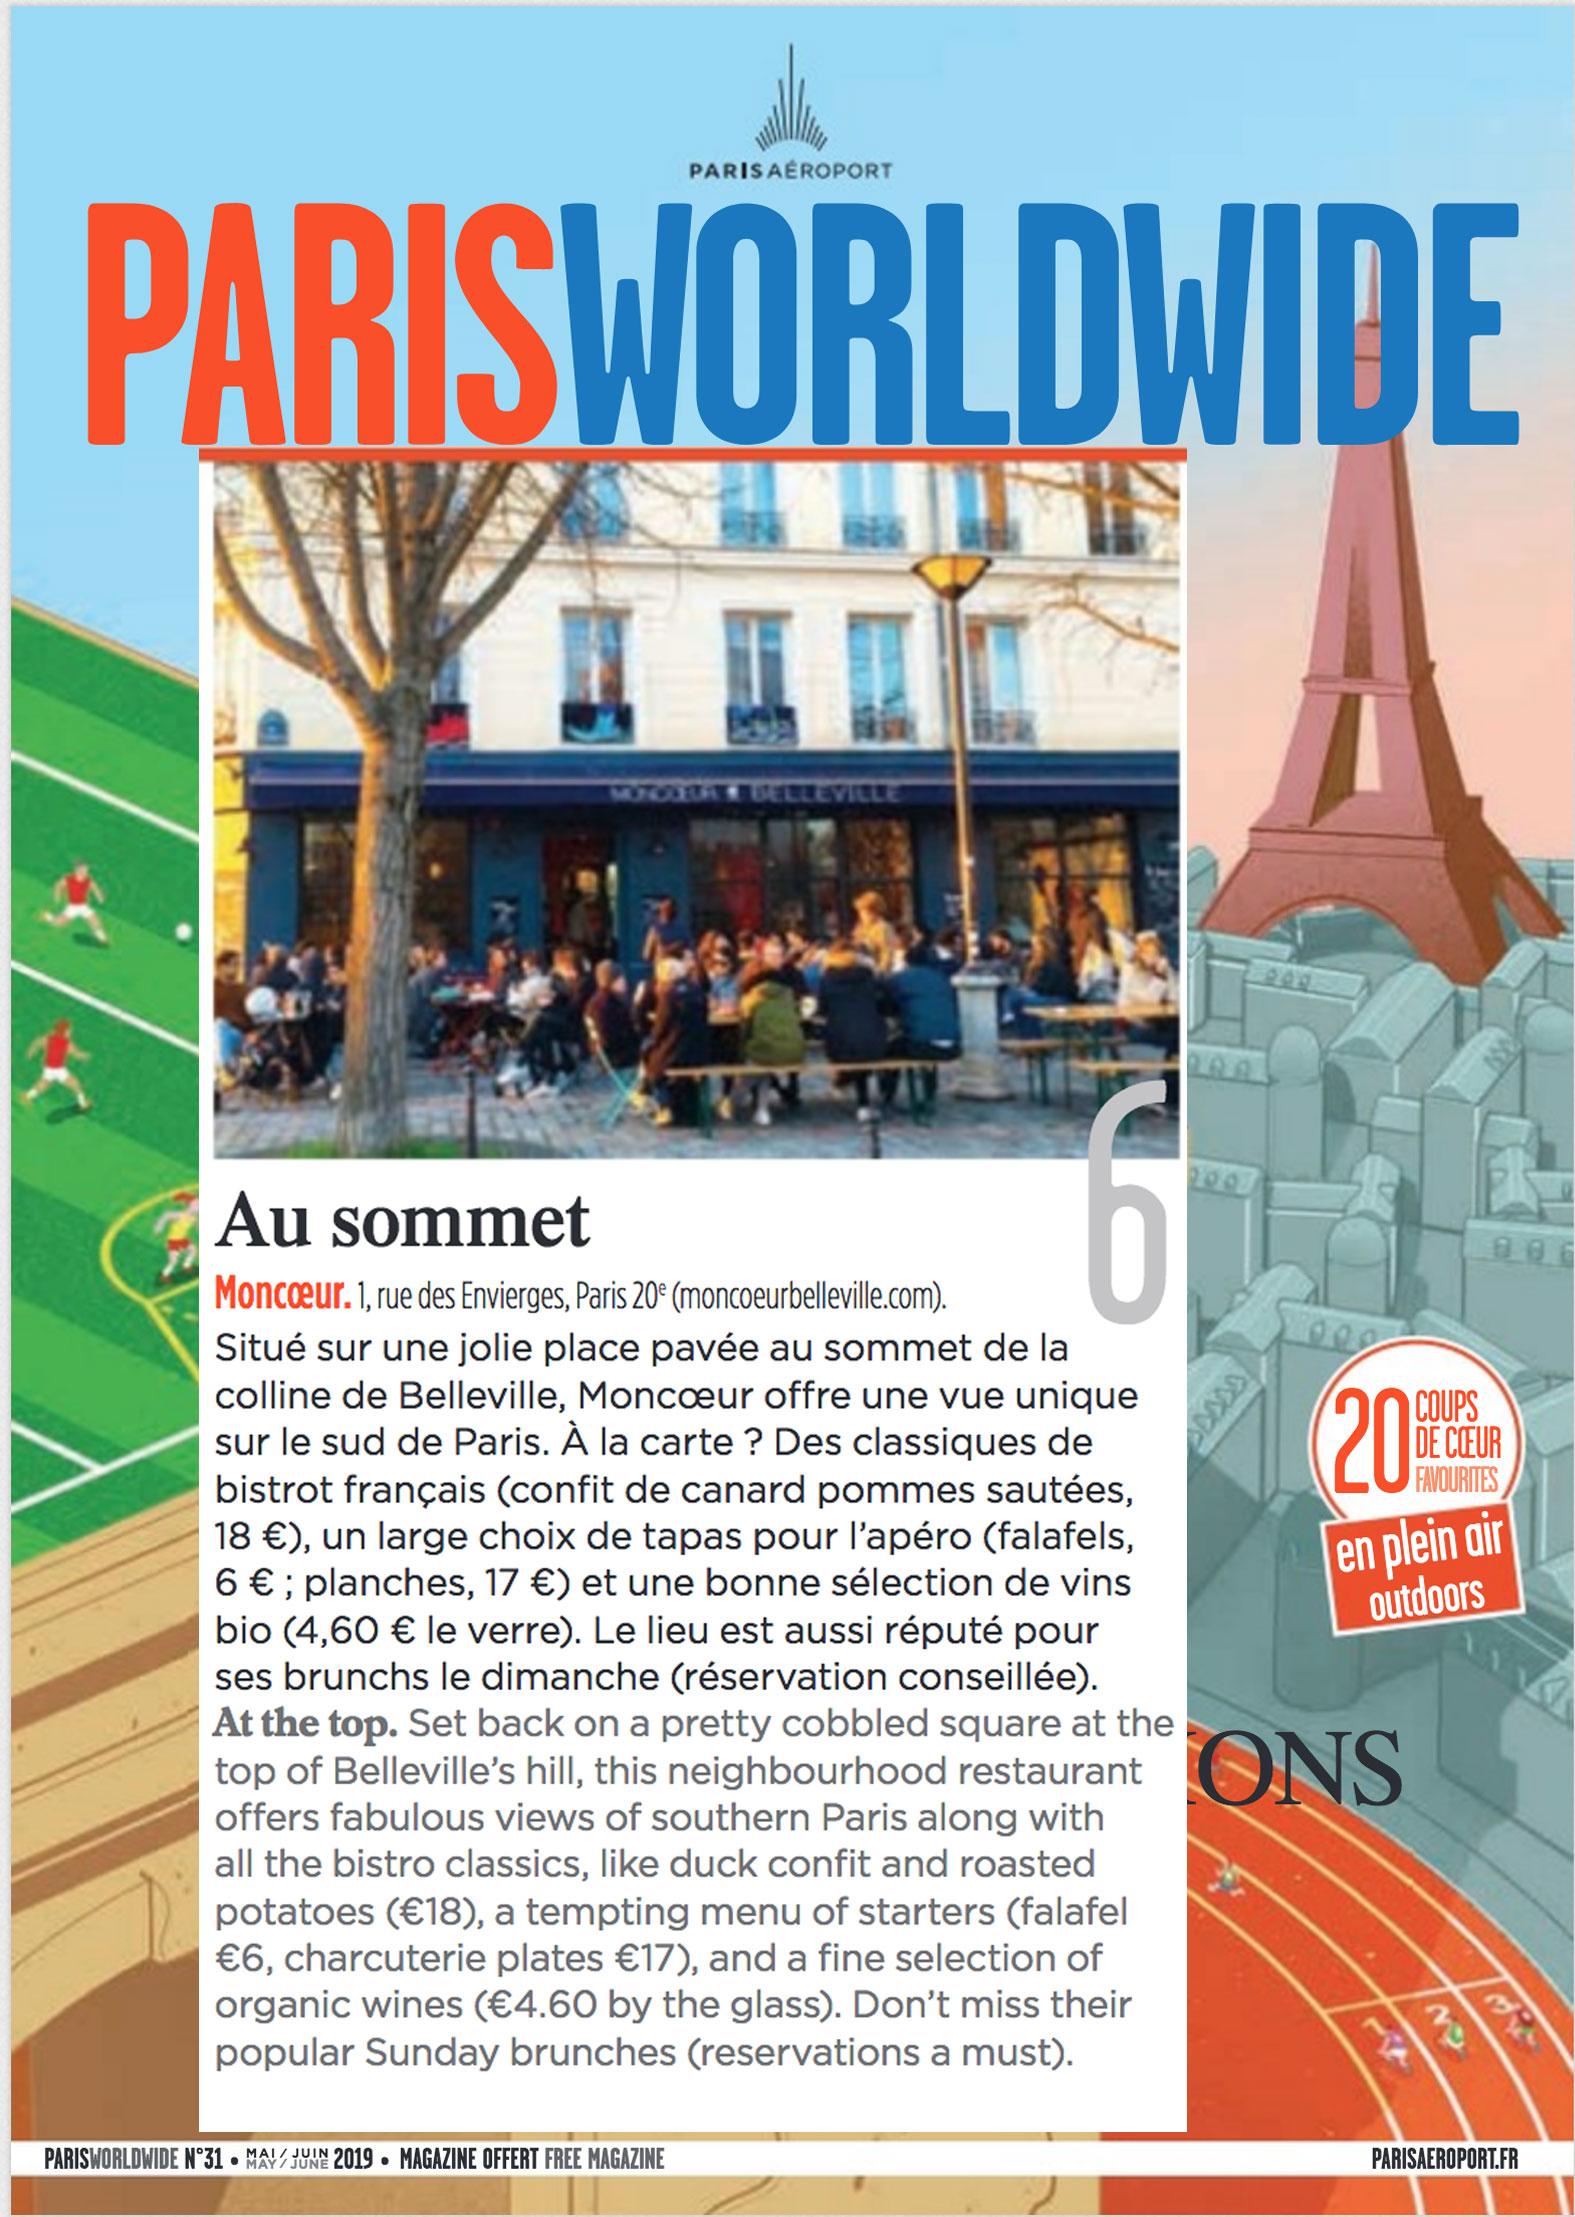 moncoeur-pariswordwide-mai-2019